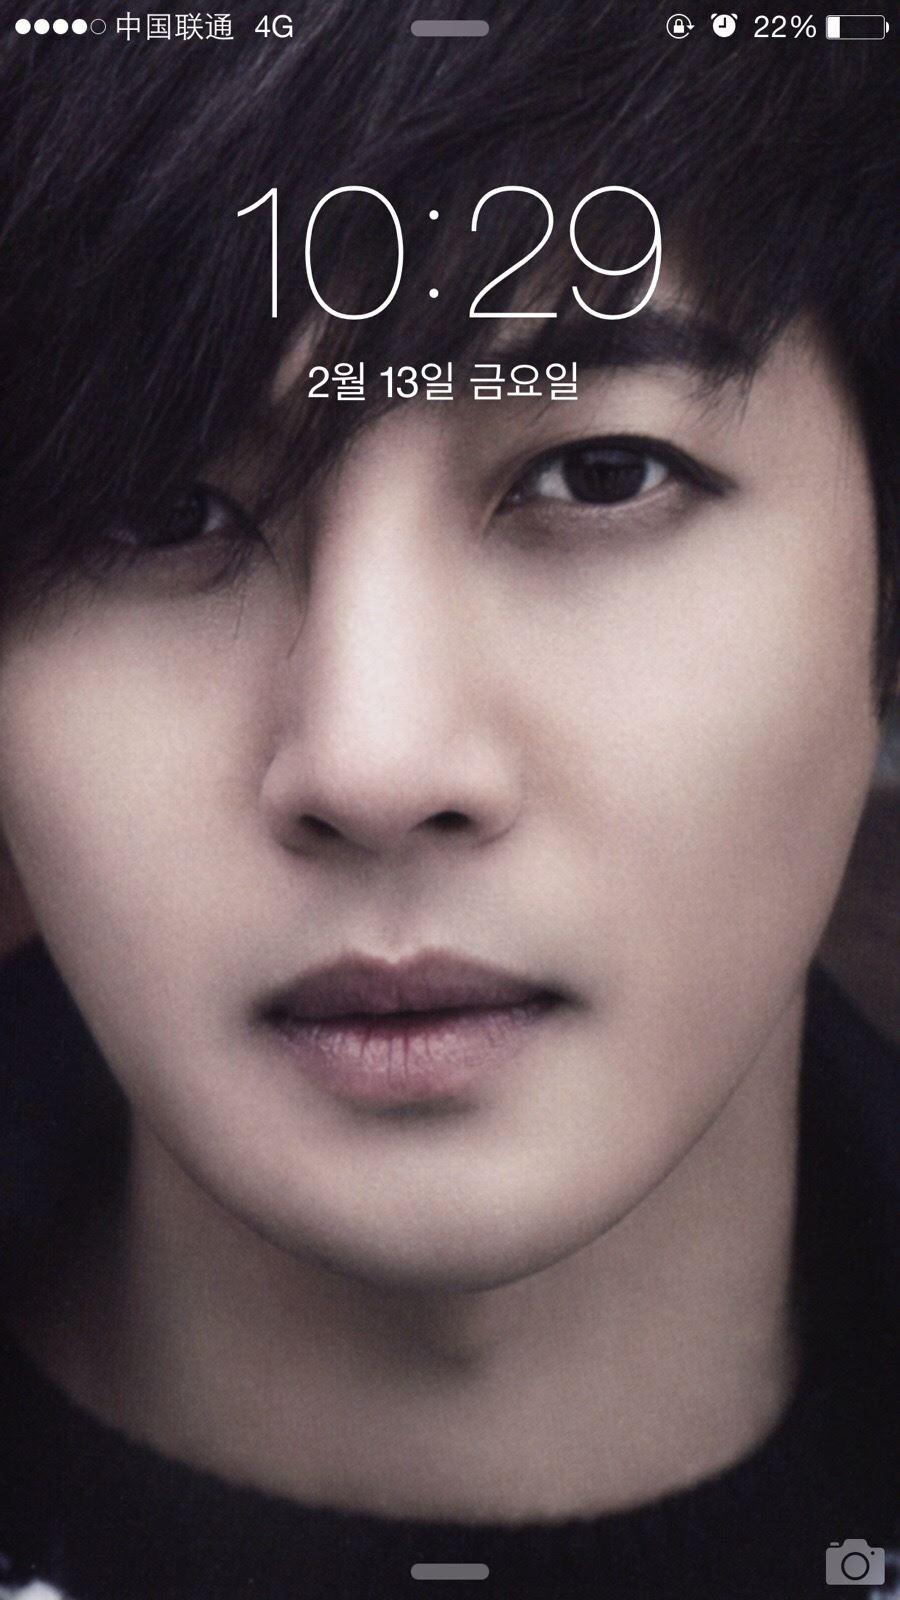 Hyun Joong Screen Saver - So Handsome Upclose